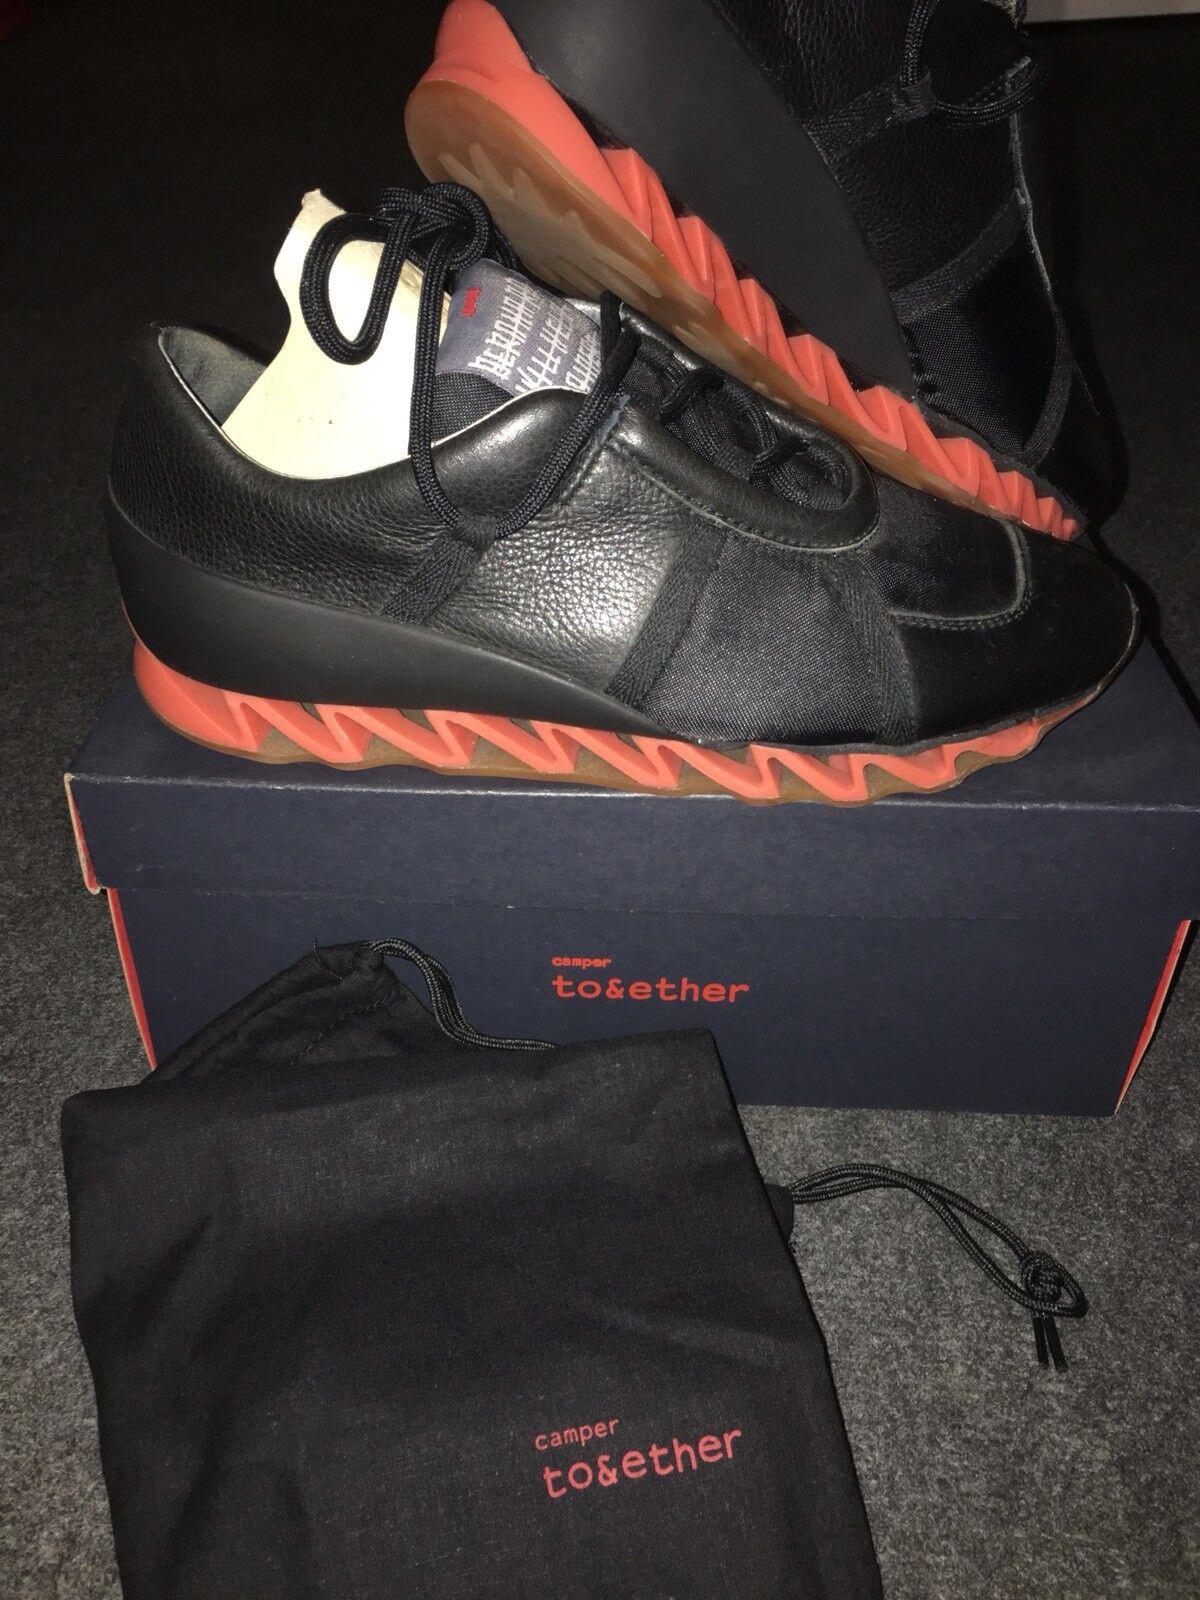 Camper Together X Bernard Wilhelm Himalayan Sneakers EU 41 / US 10 - NEW In Box